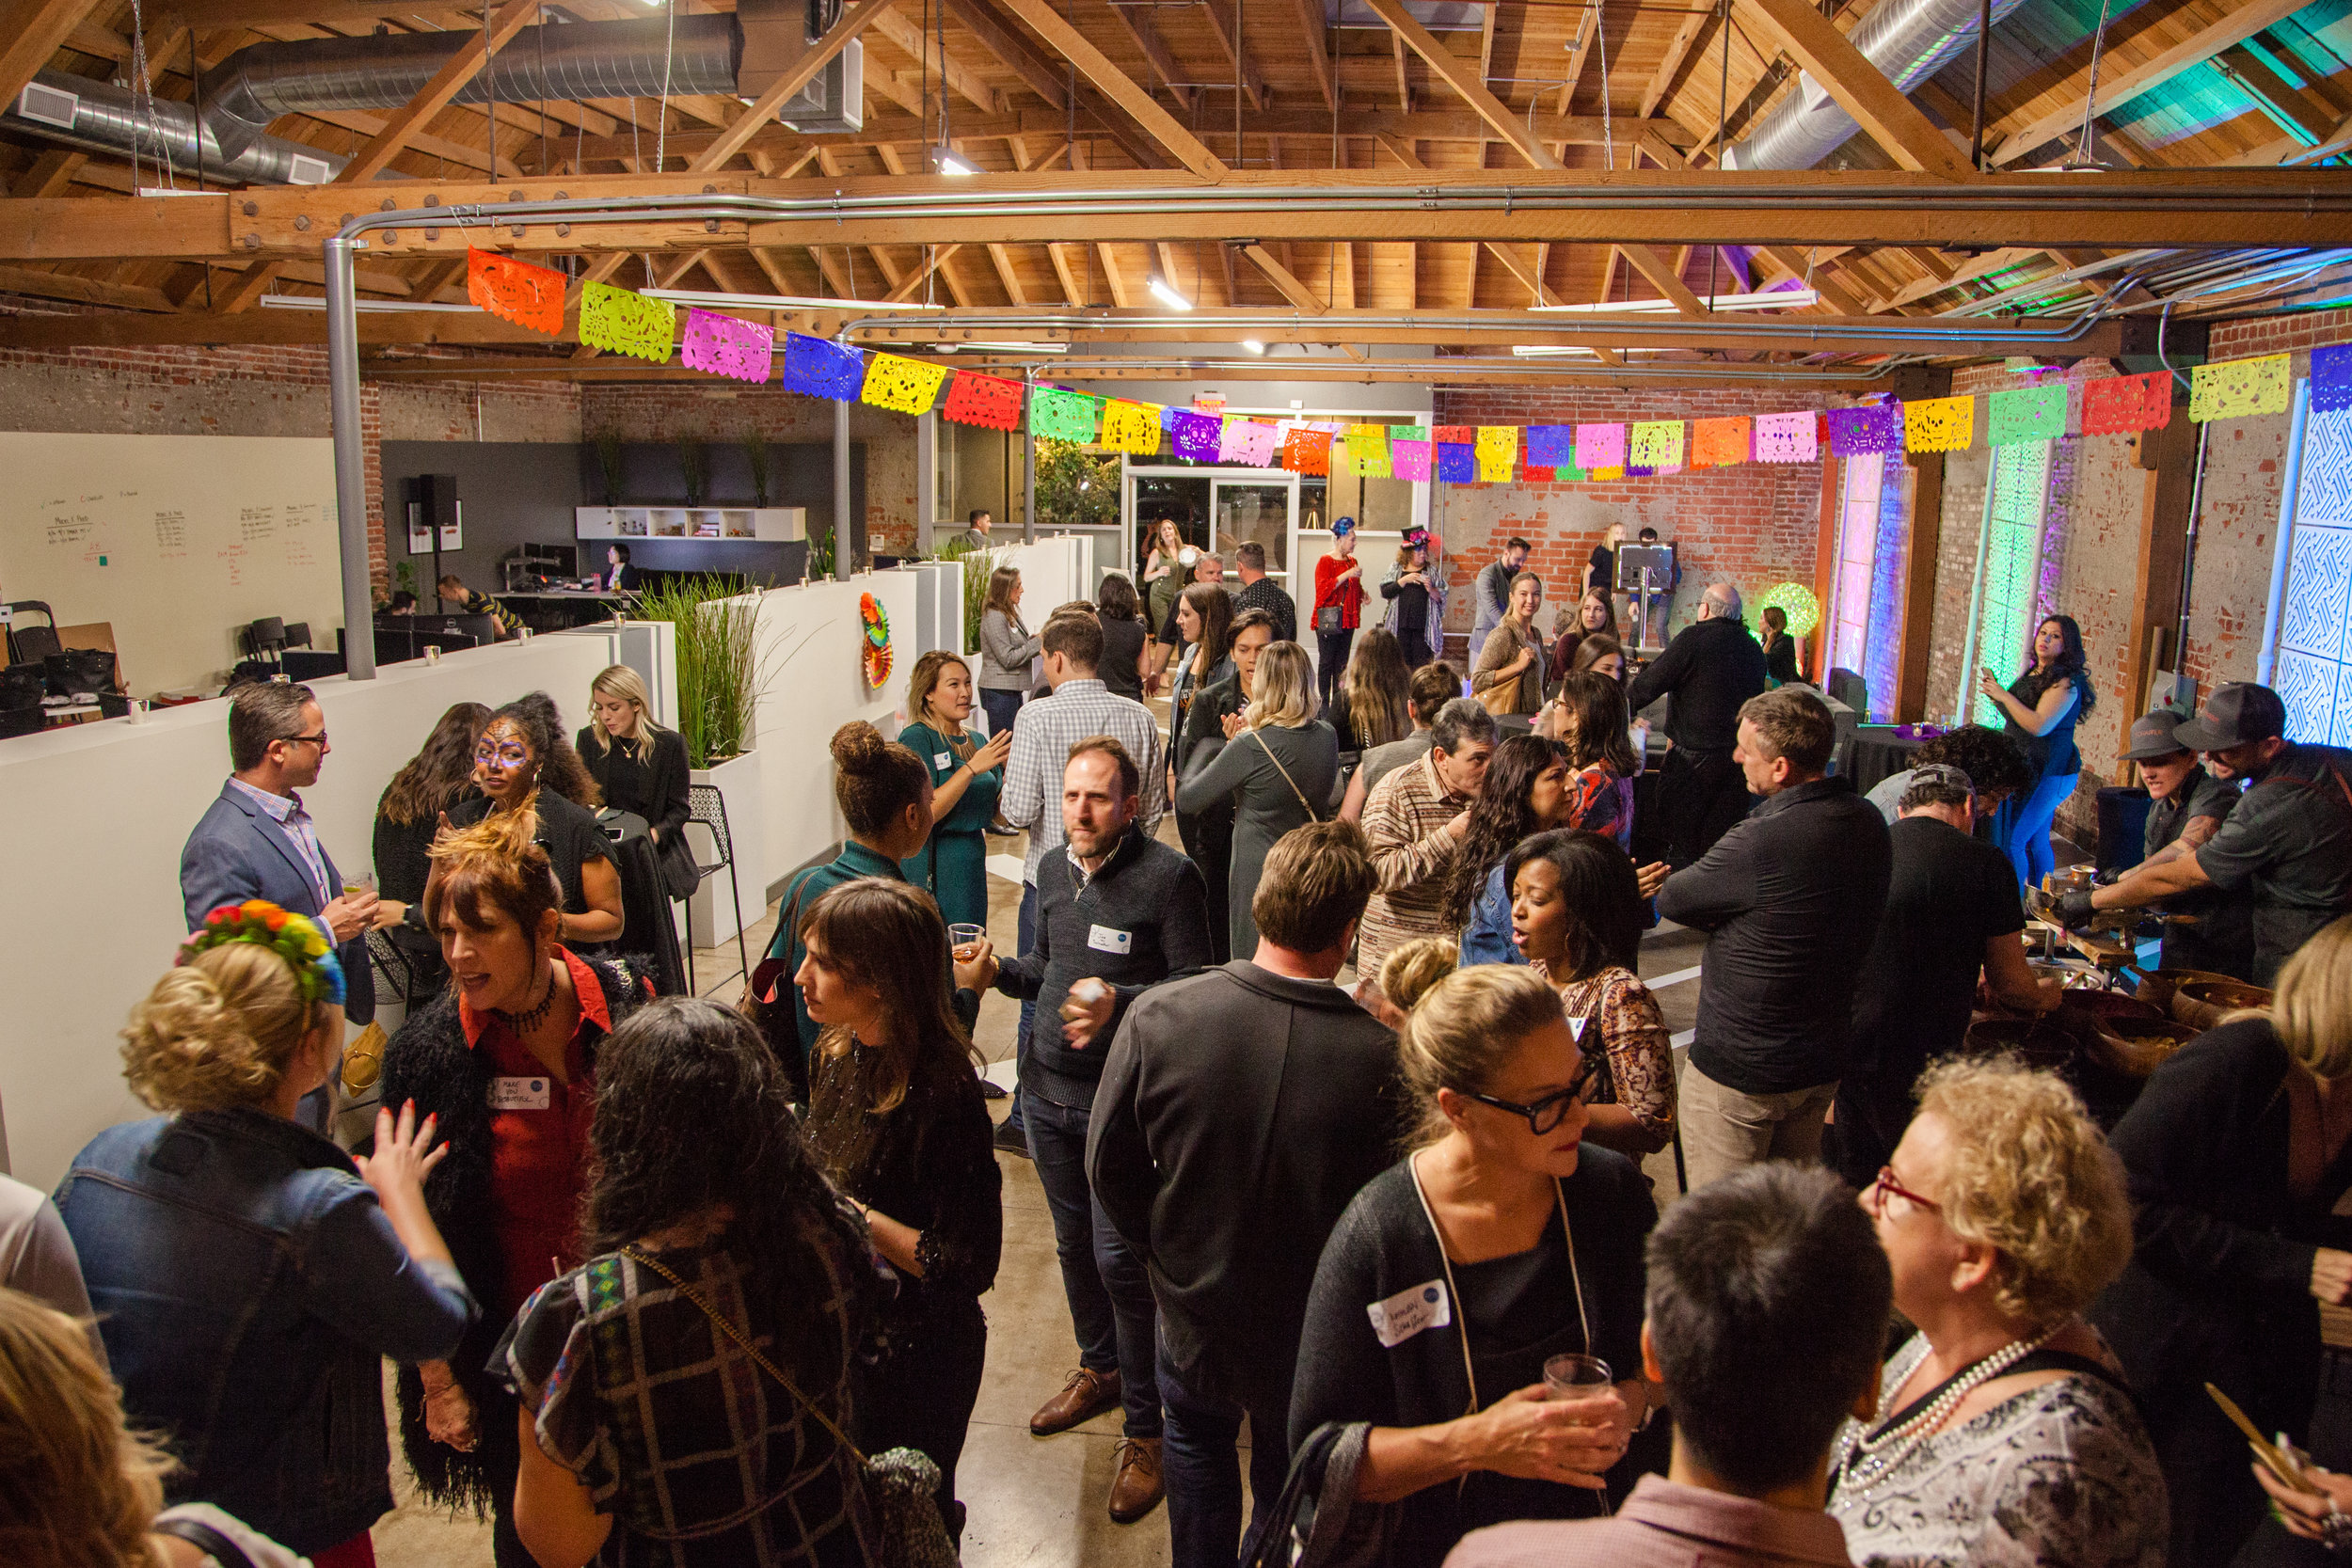 November 1, 2018 - 'fête of the dead' DÍA DE LOS MUERTOS Host Venue: MG Studios, DTLACatering: Schaffer / Bar: ScarlettePhotographs by CHARLEY STAR PHOTOGRAPHYClick Here